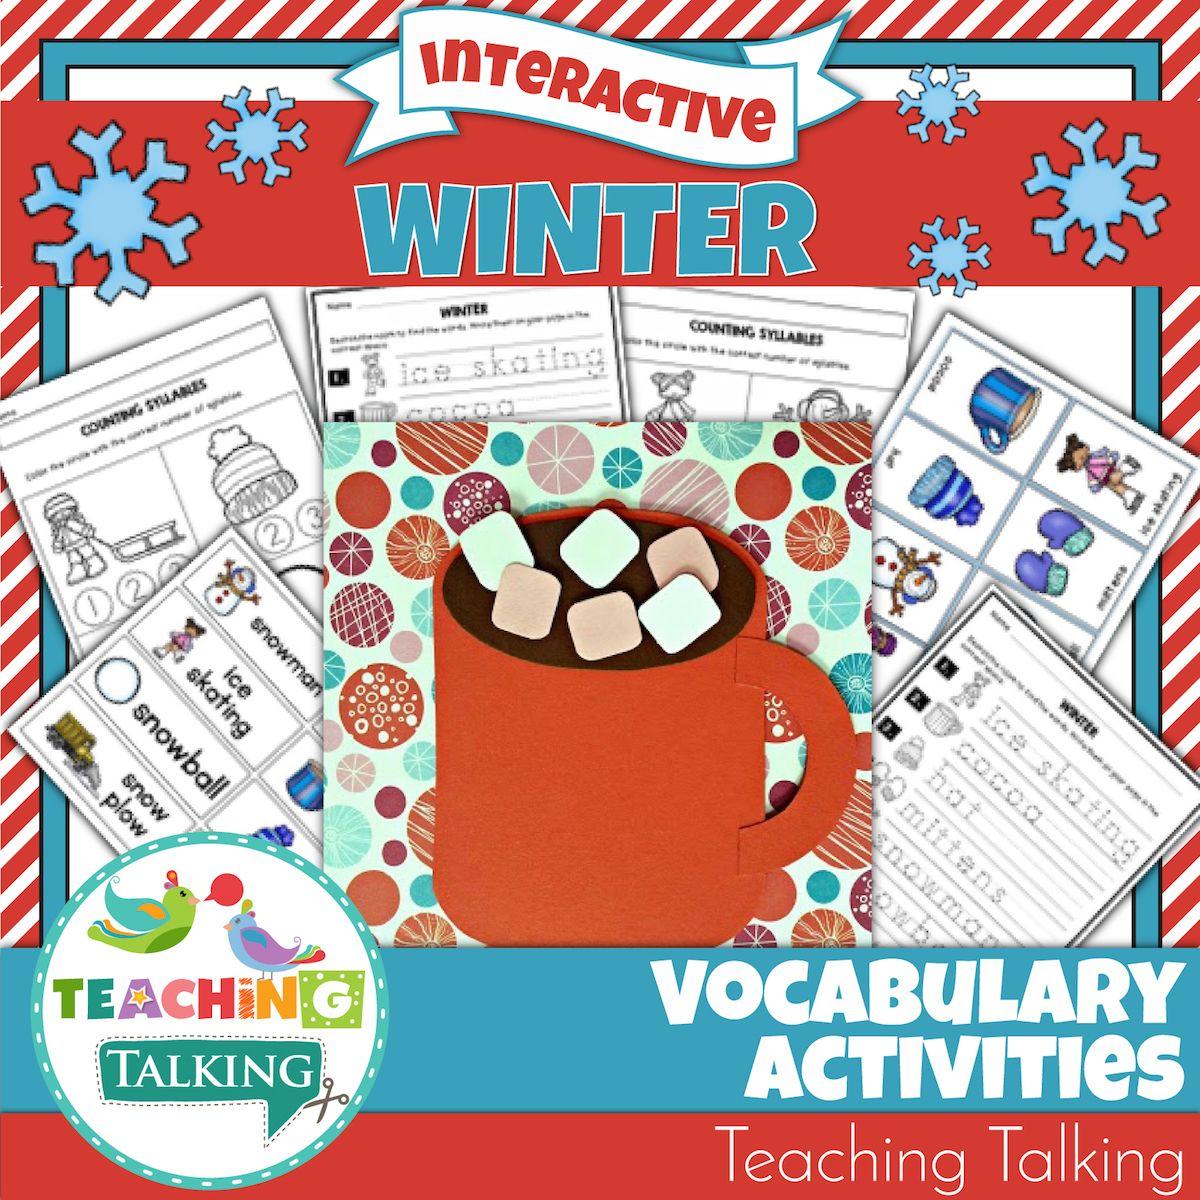 Winter Vocabulary Activities For Speech And Language